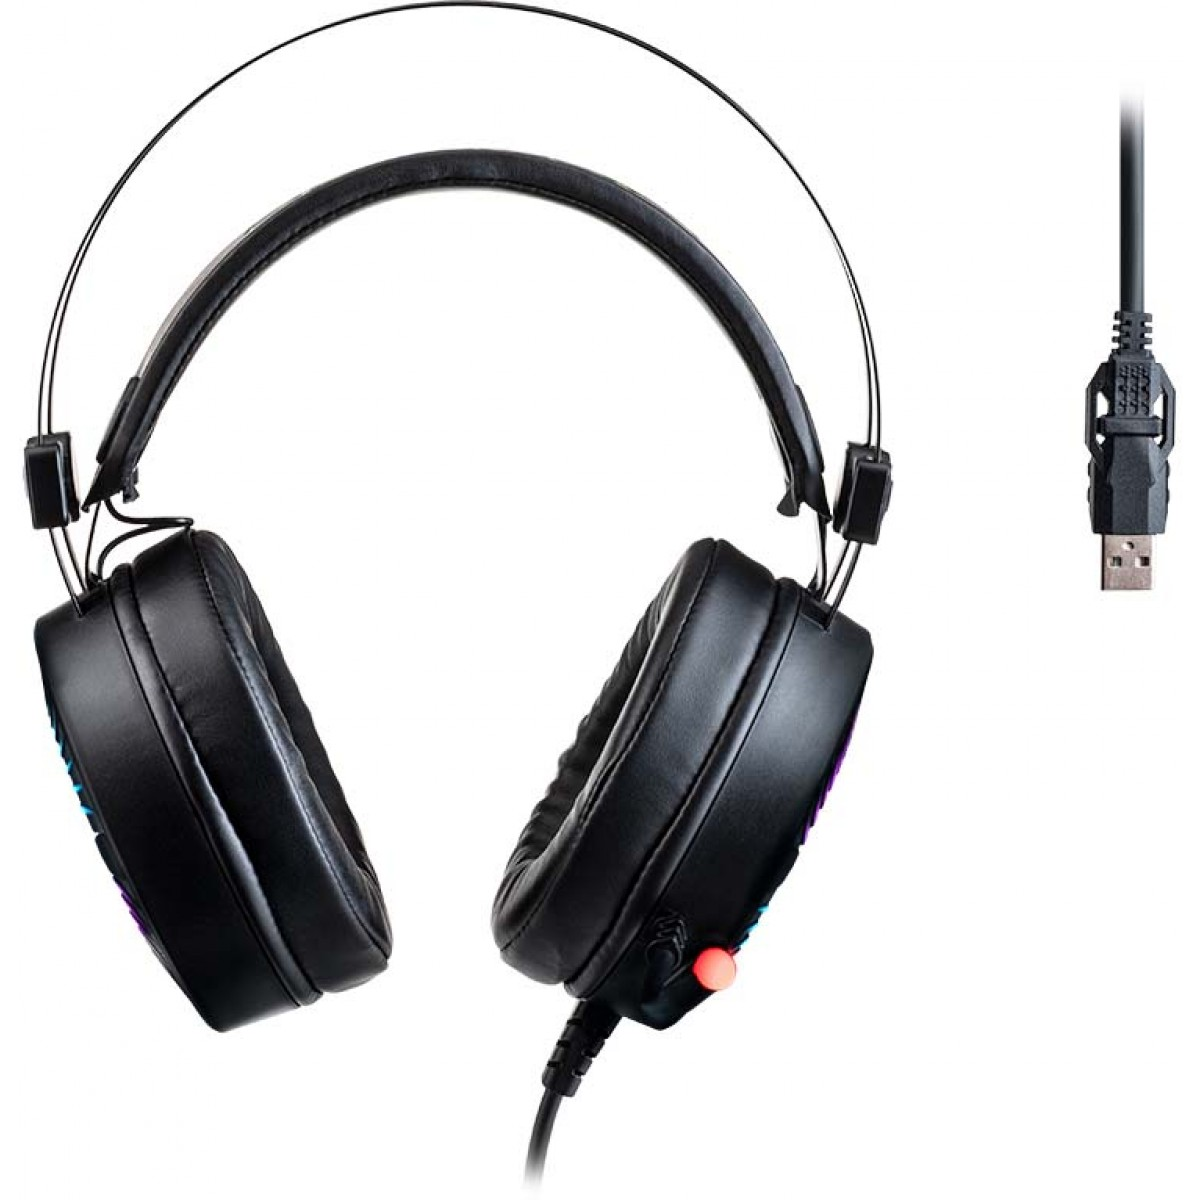 Headset Gamer Warrior Flamma, RGB, Stereo, Black, PH306